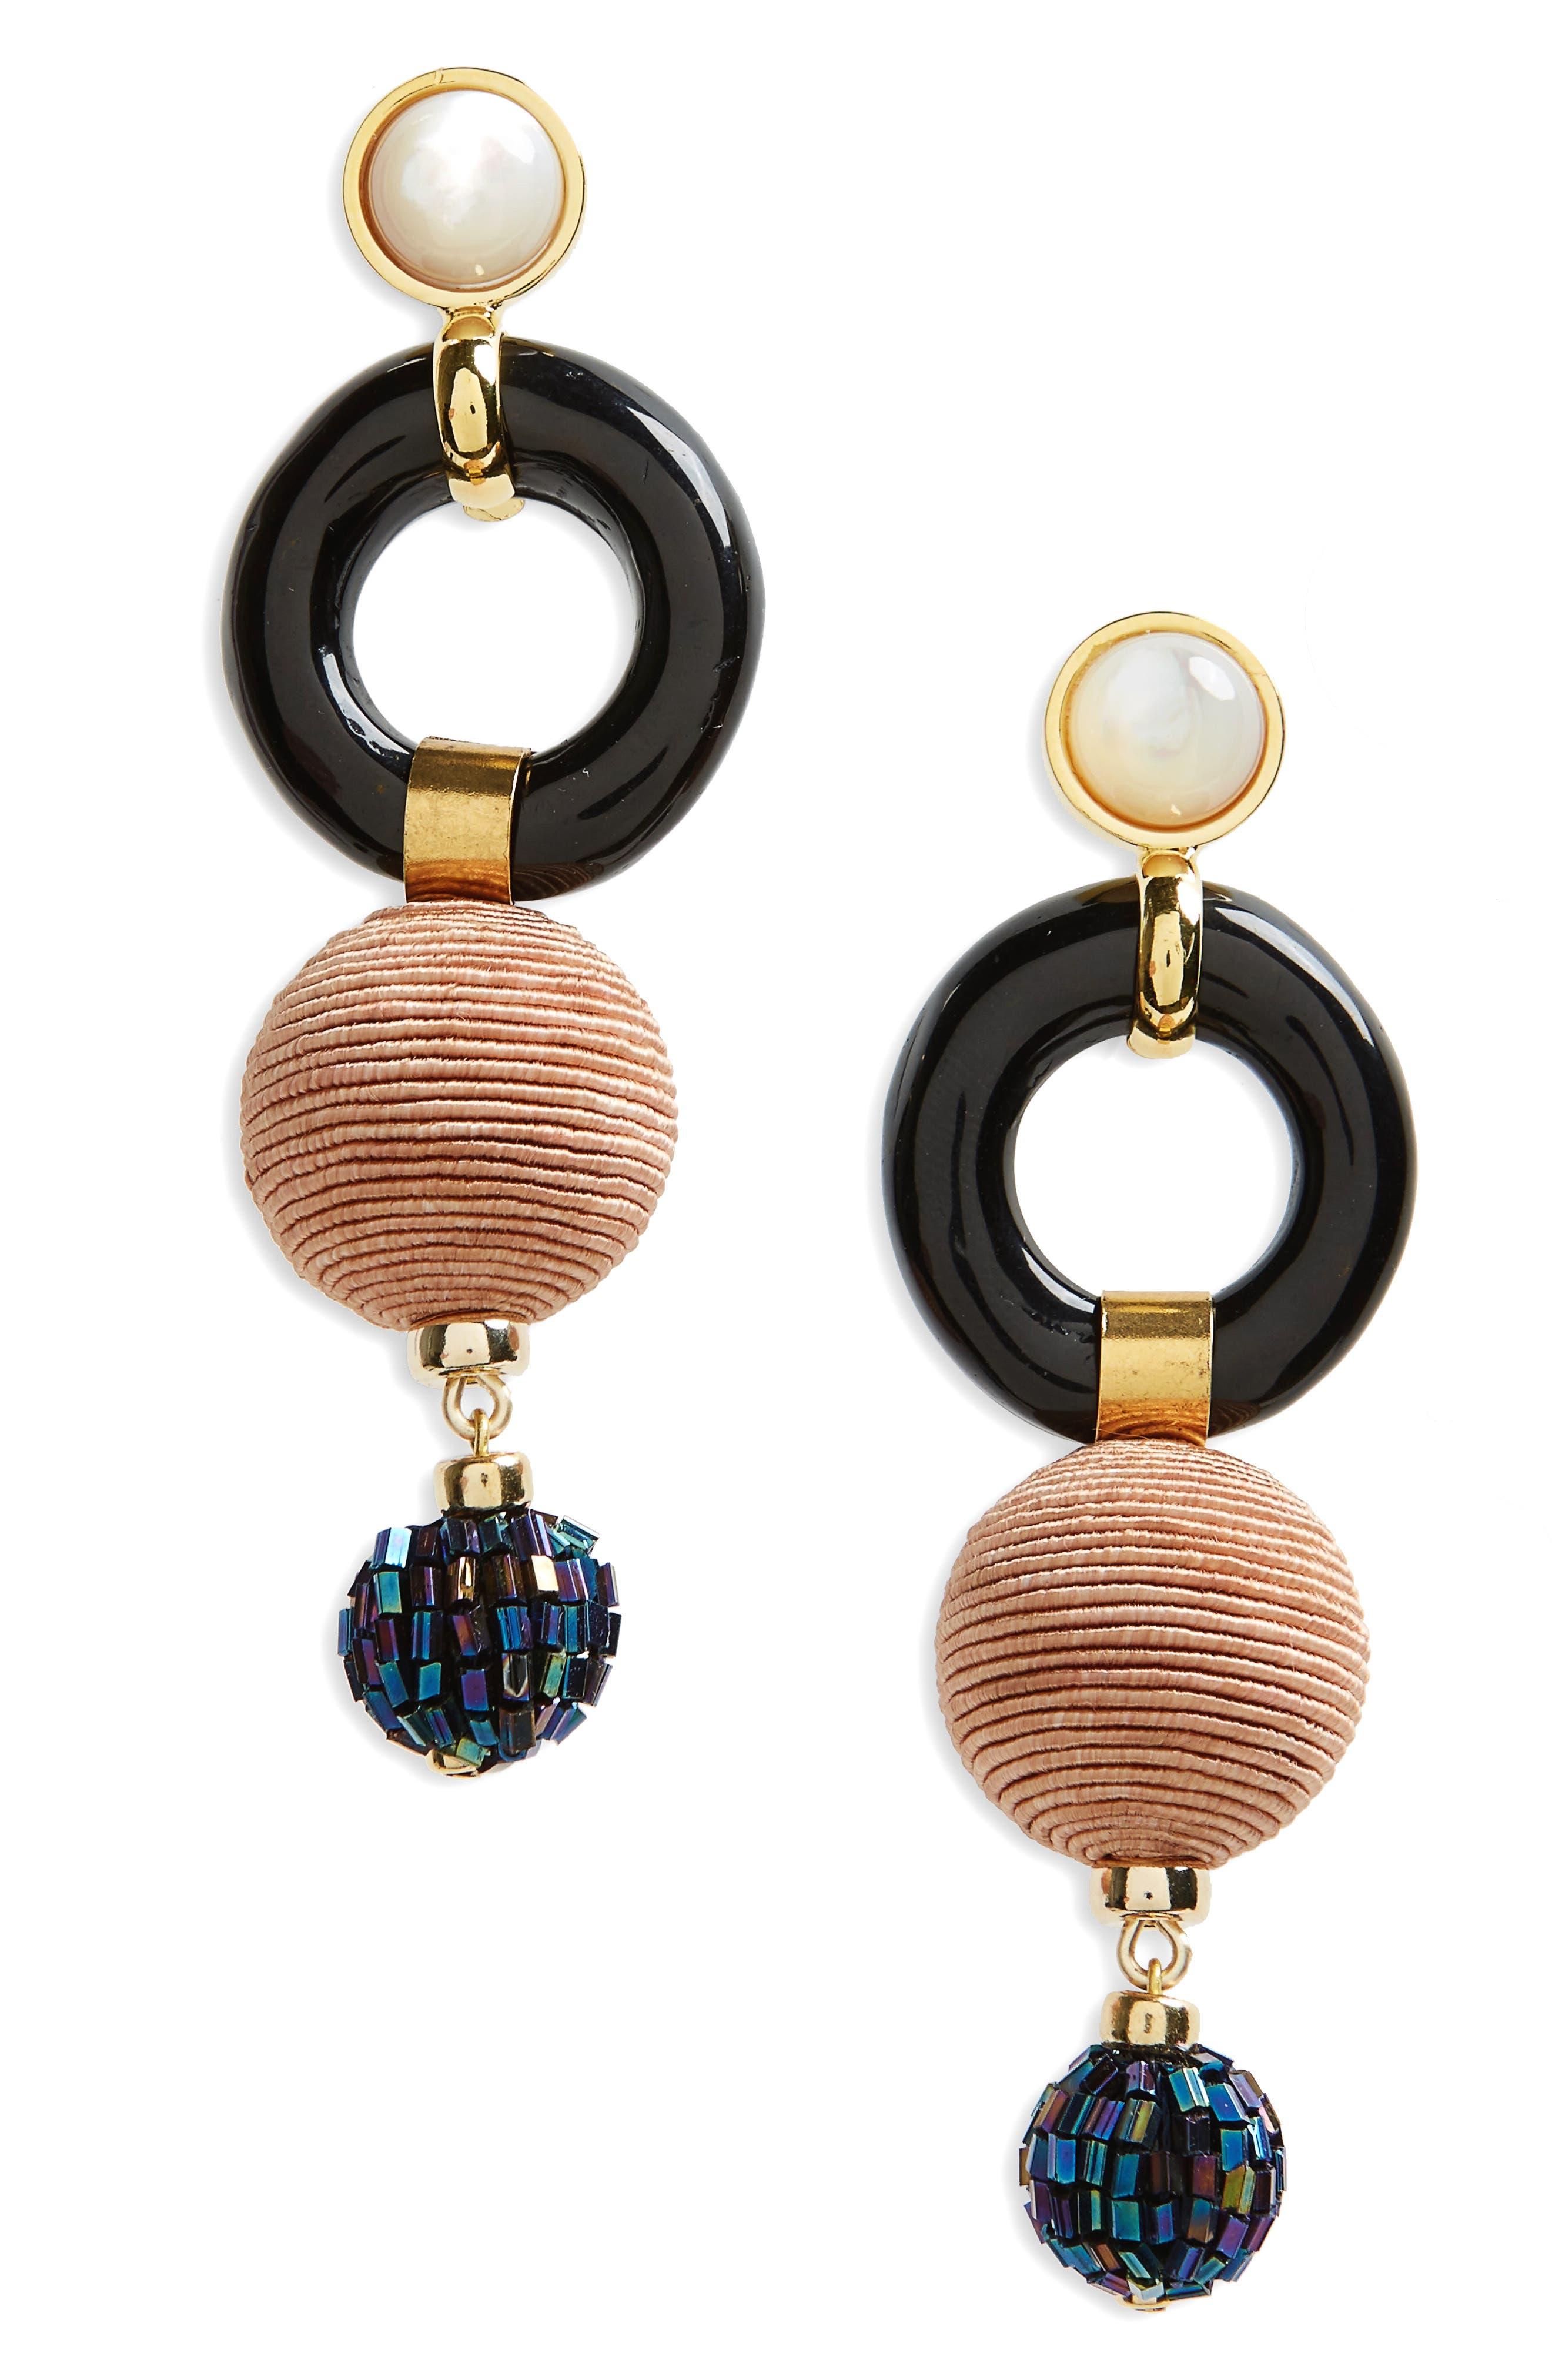 Main Image - Lizzie Fortunato Loop Chain Earrings